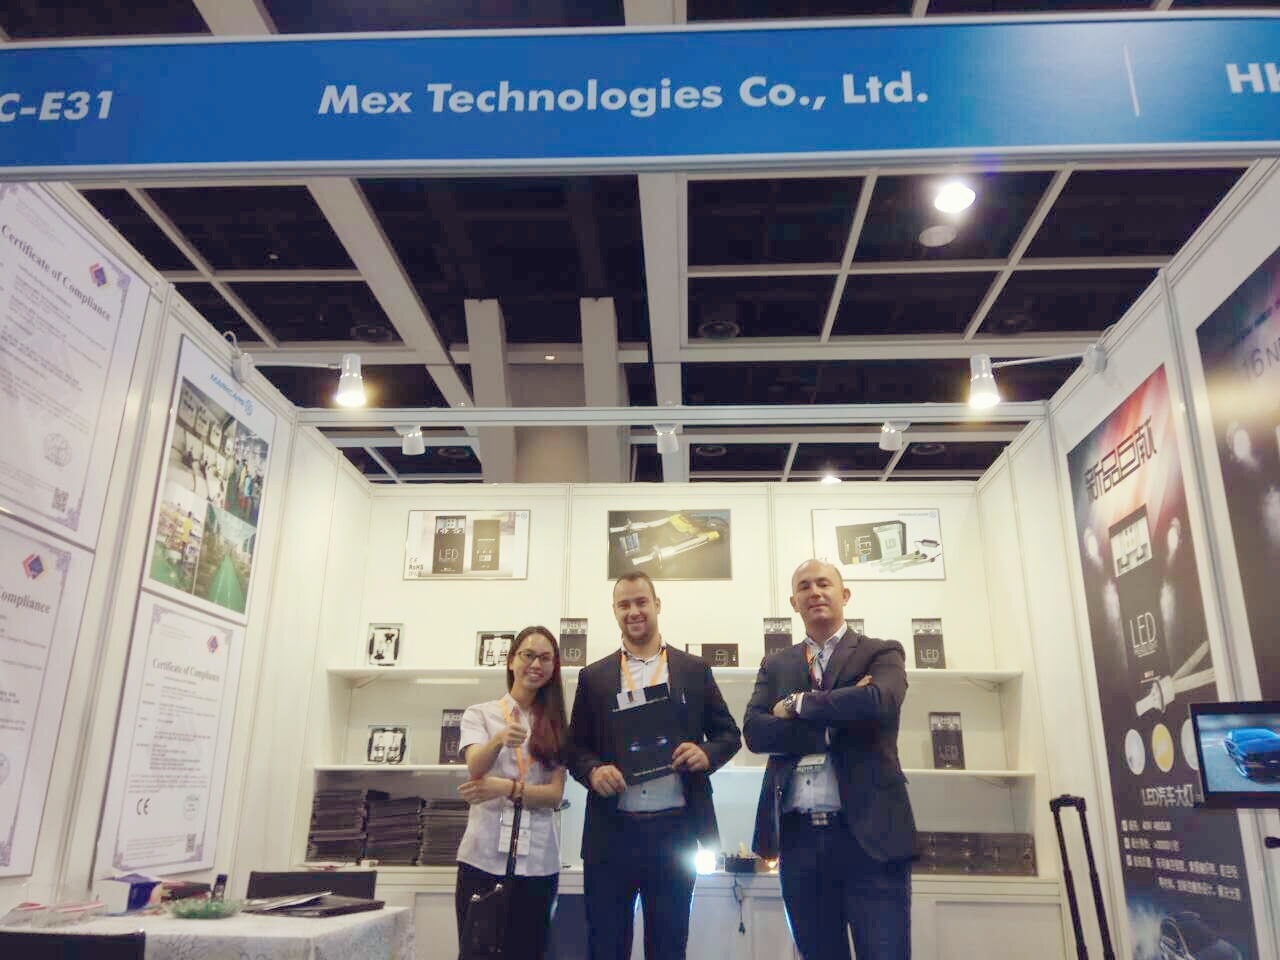 HK Fair met our America client